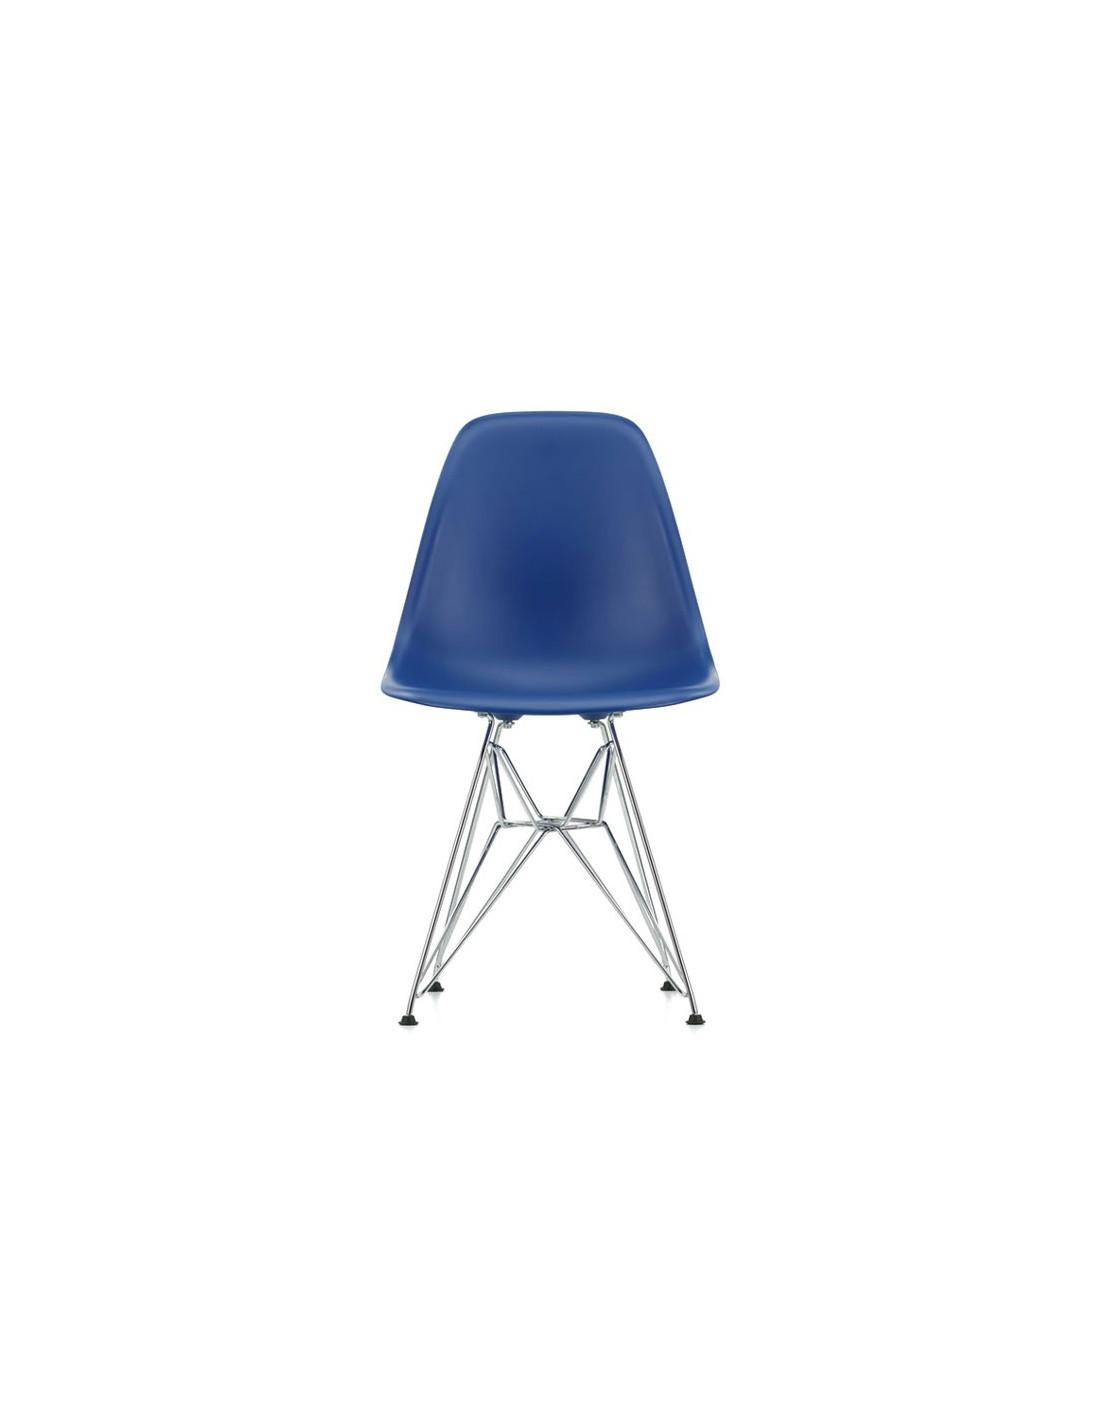 Chaise dsr design charles ray eames pour vitra la boutique danoise - Chaise eames vitra ...